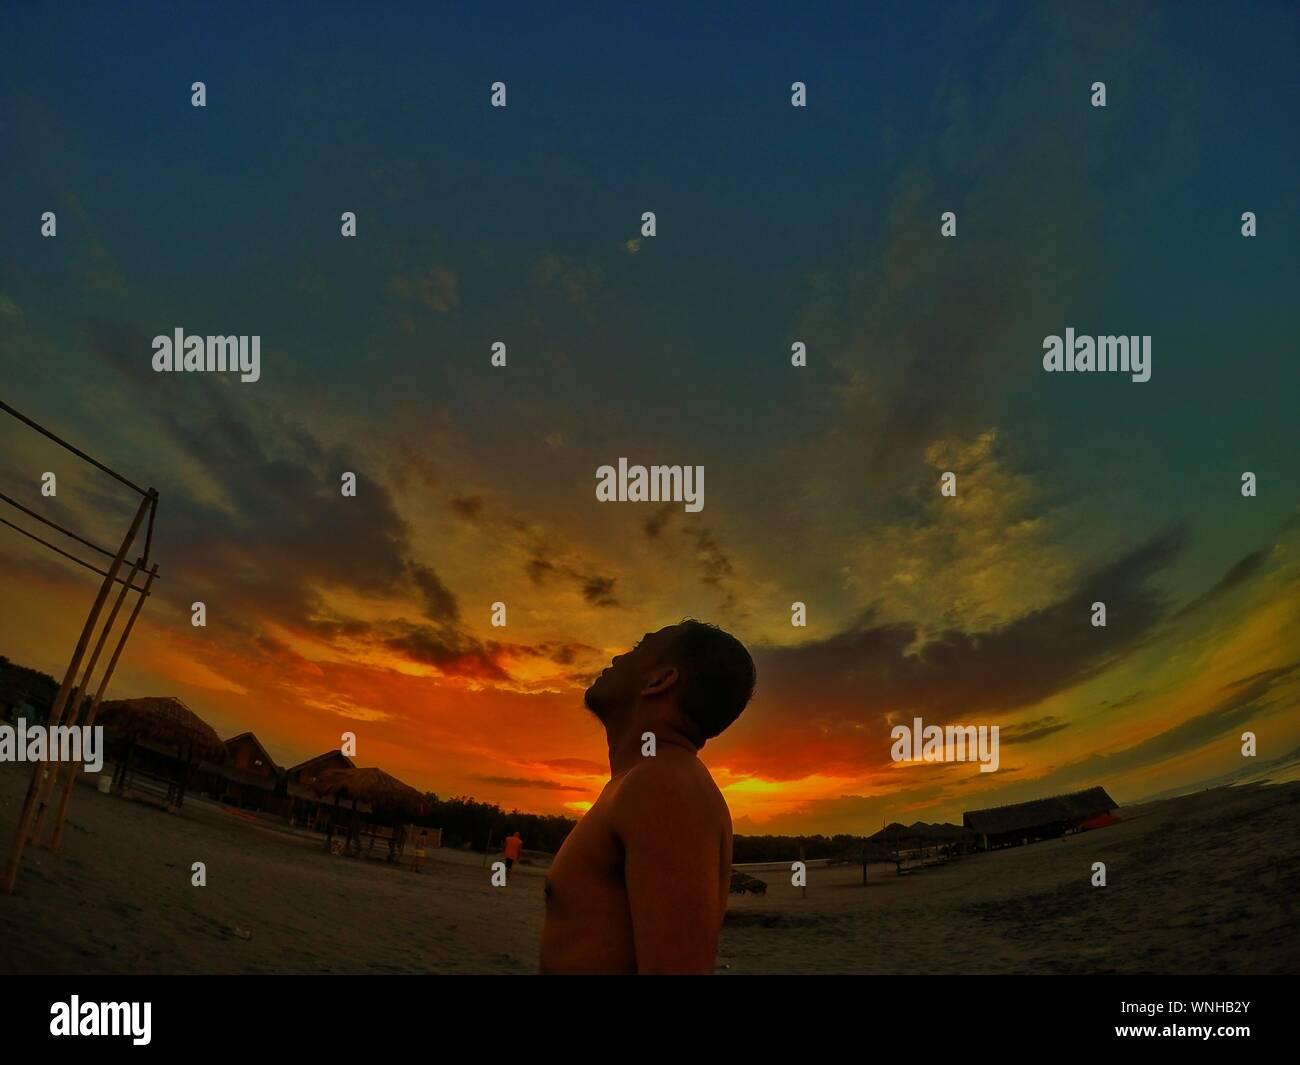 Shirtless Man Standing On Field Against Cloudy Sky pendant le coucher du soleil Banque D'Images